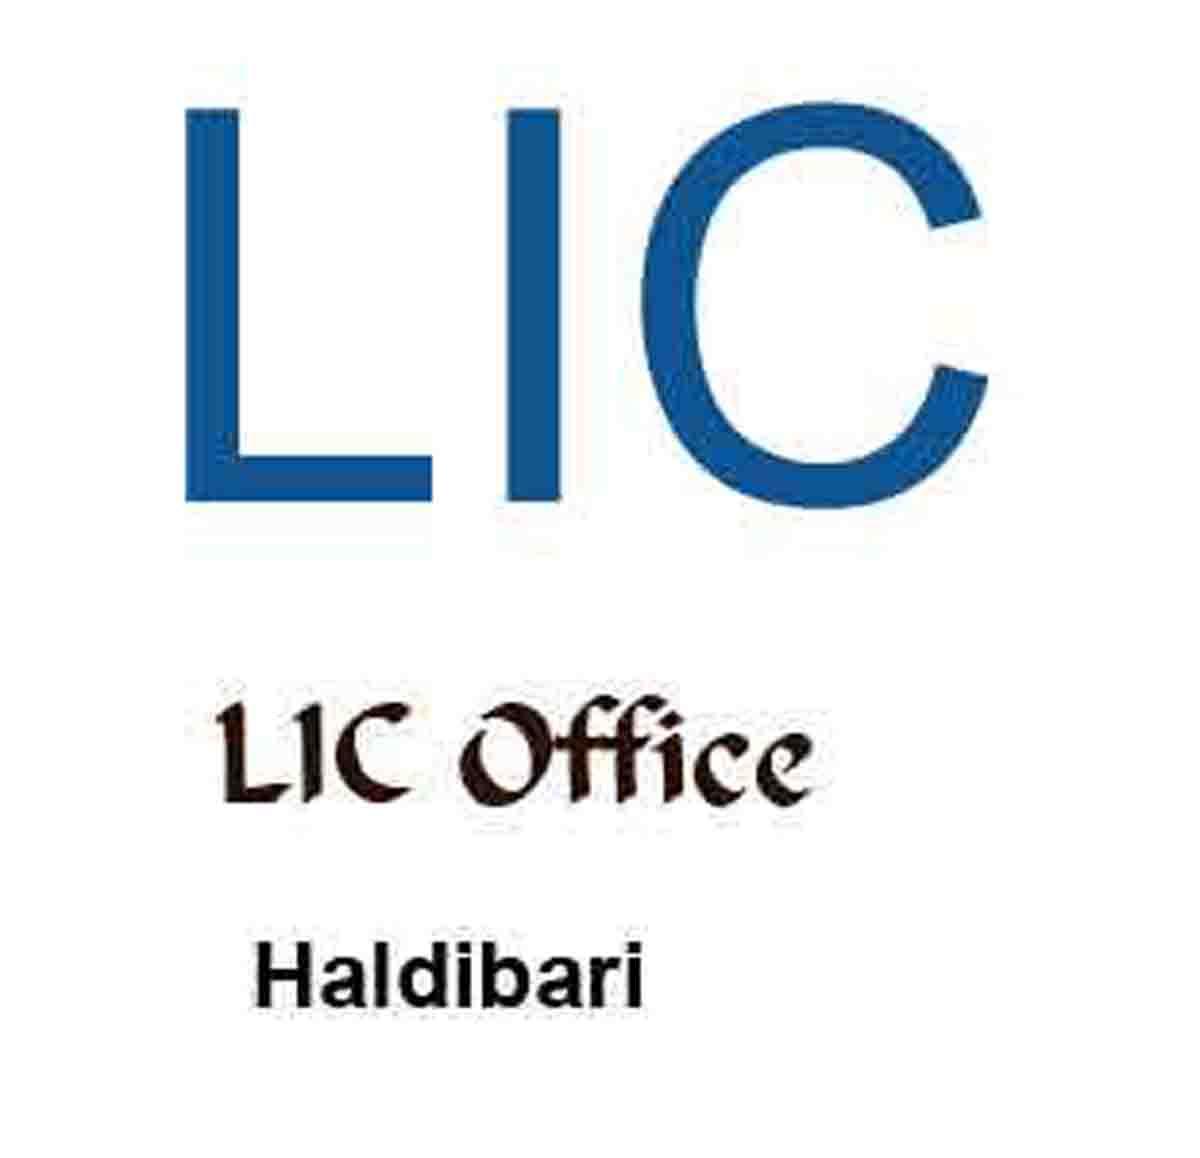 lic office haldibari